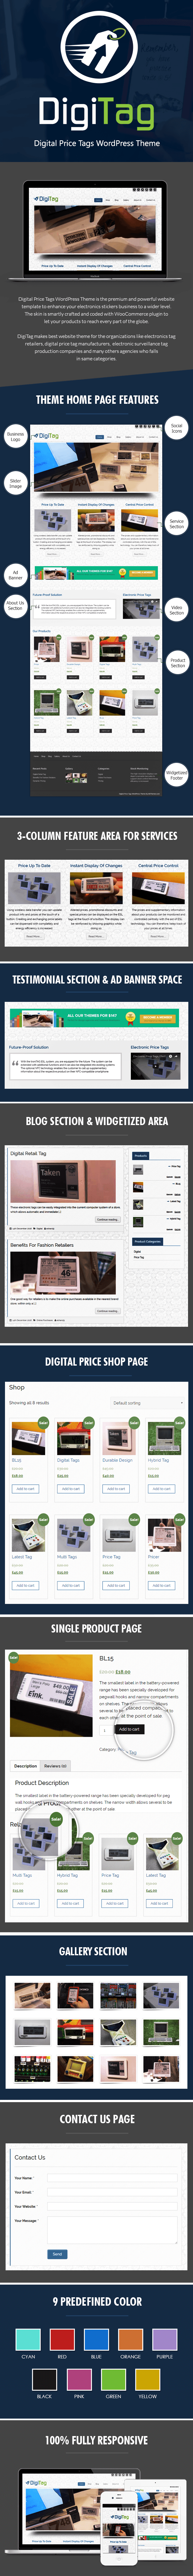 Digital Tag Price